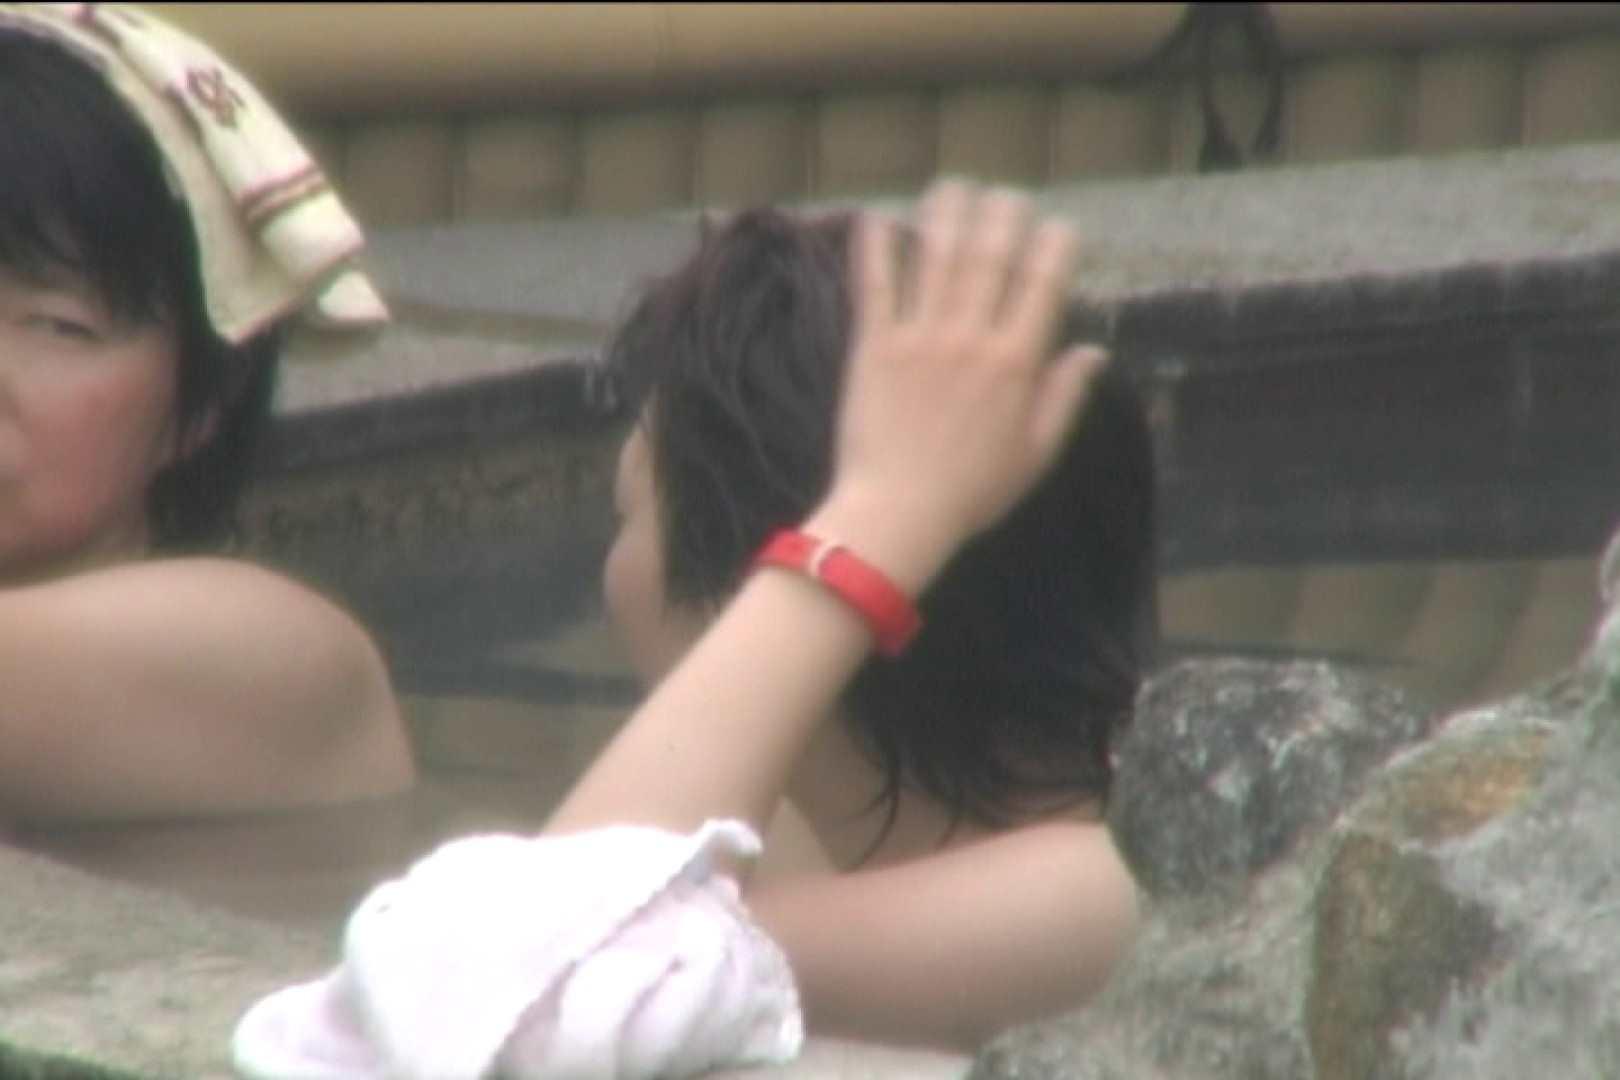 Aquaな露天風呂Vol.122 露天 おめこ無修正動画無料 107pic 95